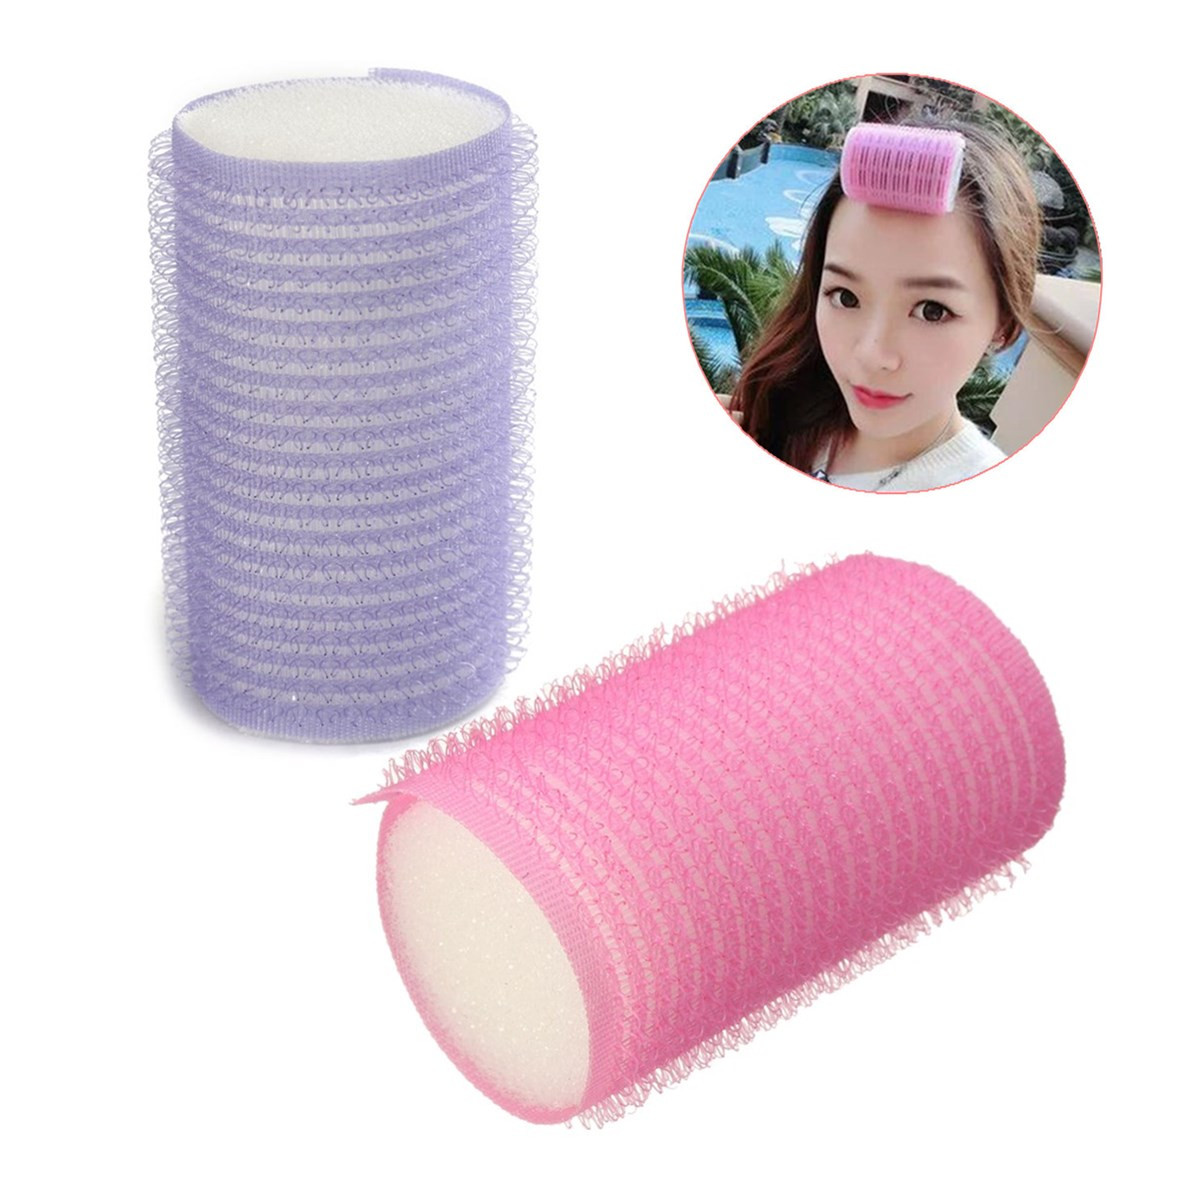 10Pcs DIY Hair Curlers Self Grip For Long/Short Hair Pink Purple Soft Foam Curlers Hair Rollers Curling For Women Sleeping